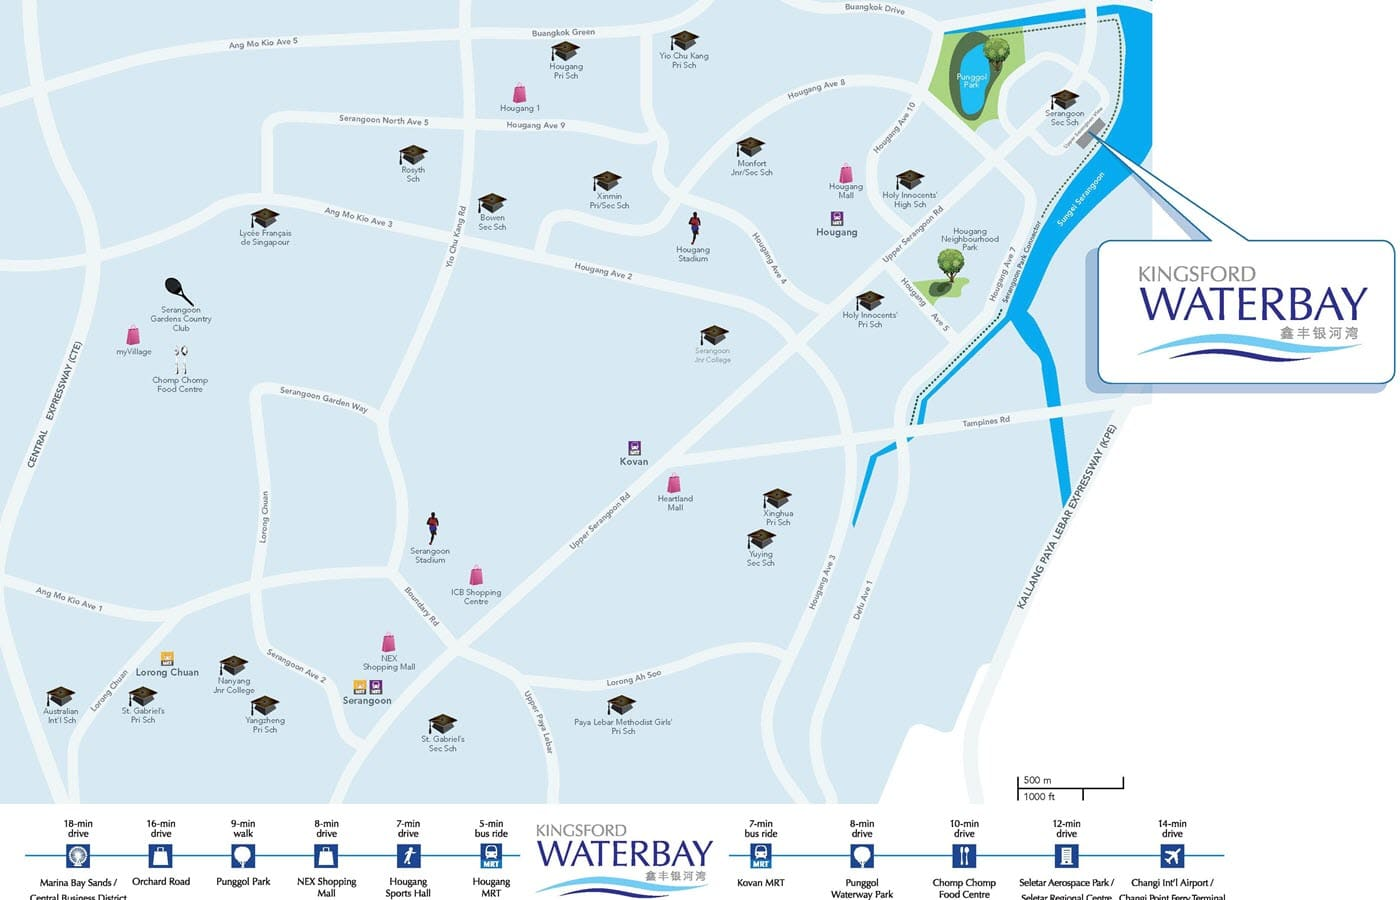 Kingsford Waterbay Condo Location Map